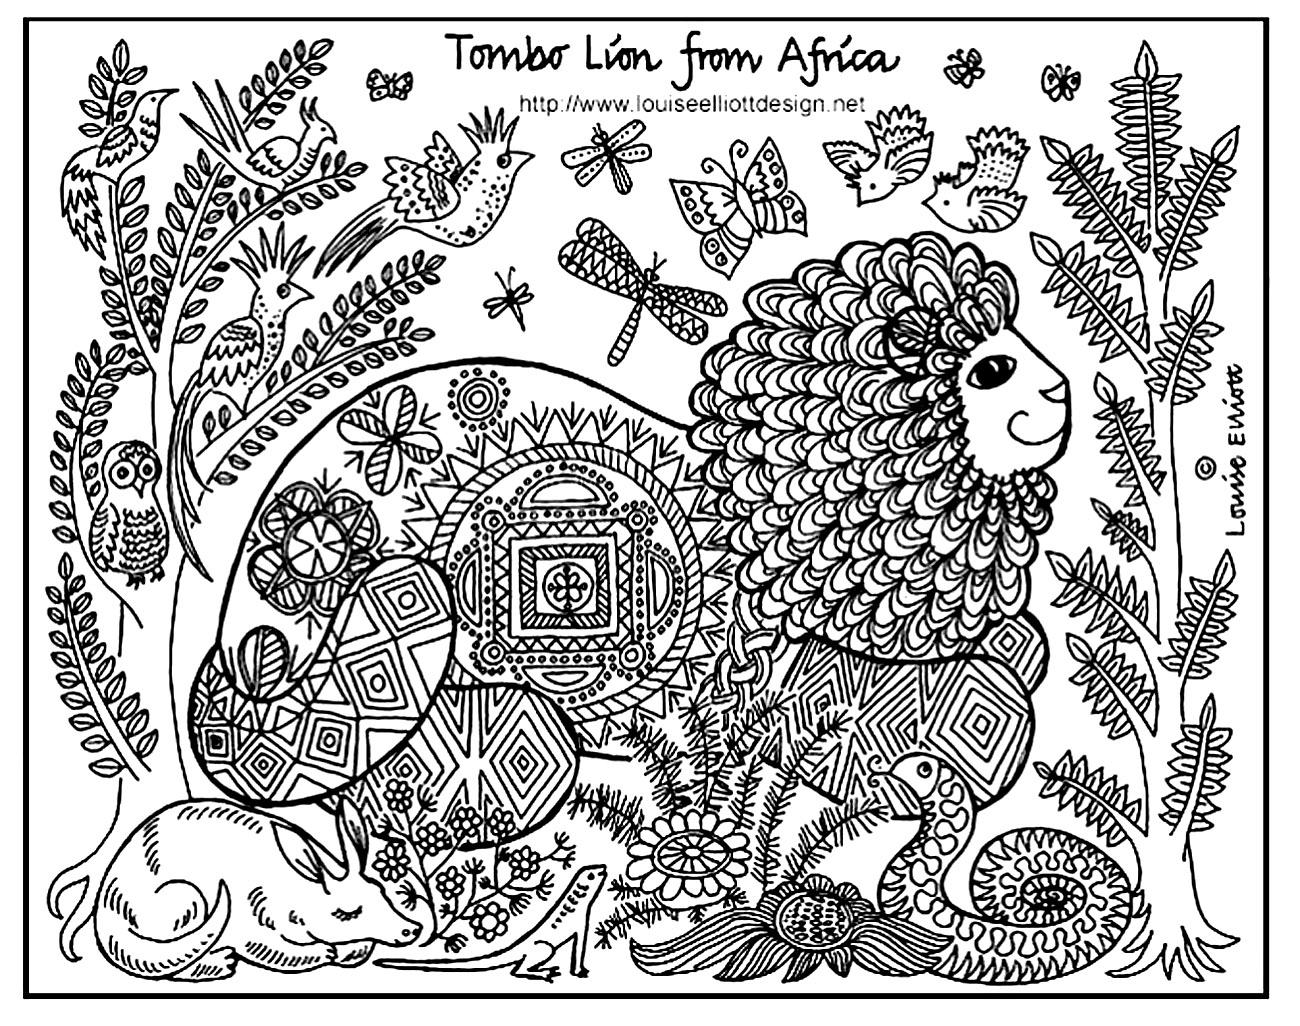 Disegni da colorare per adulti : Africa - 11